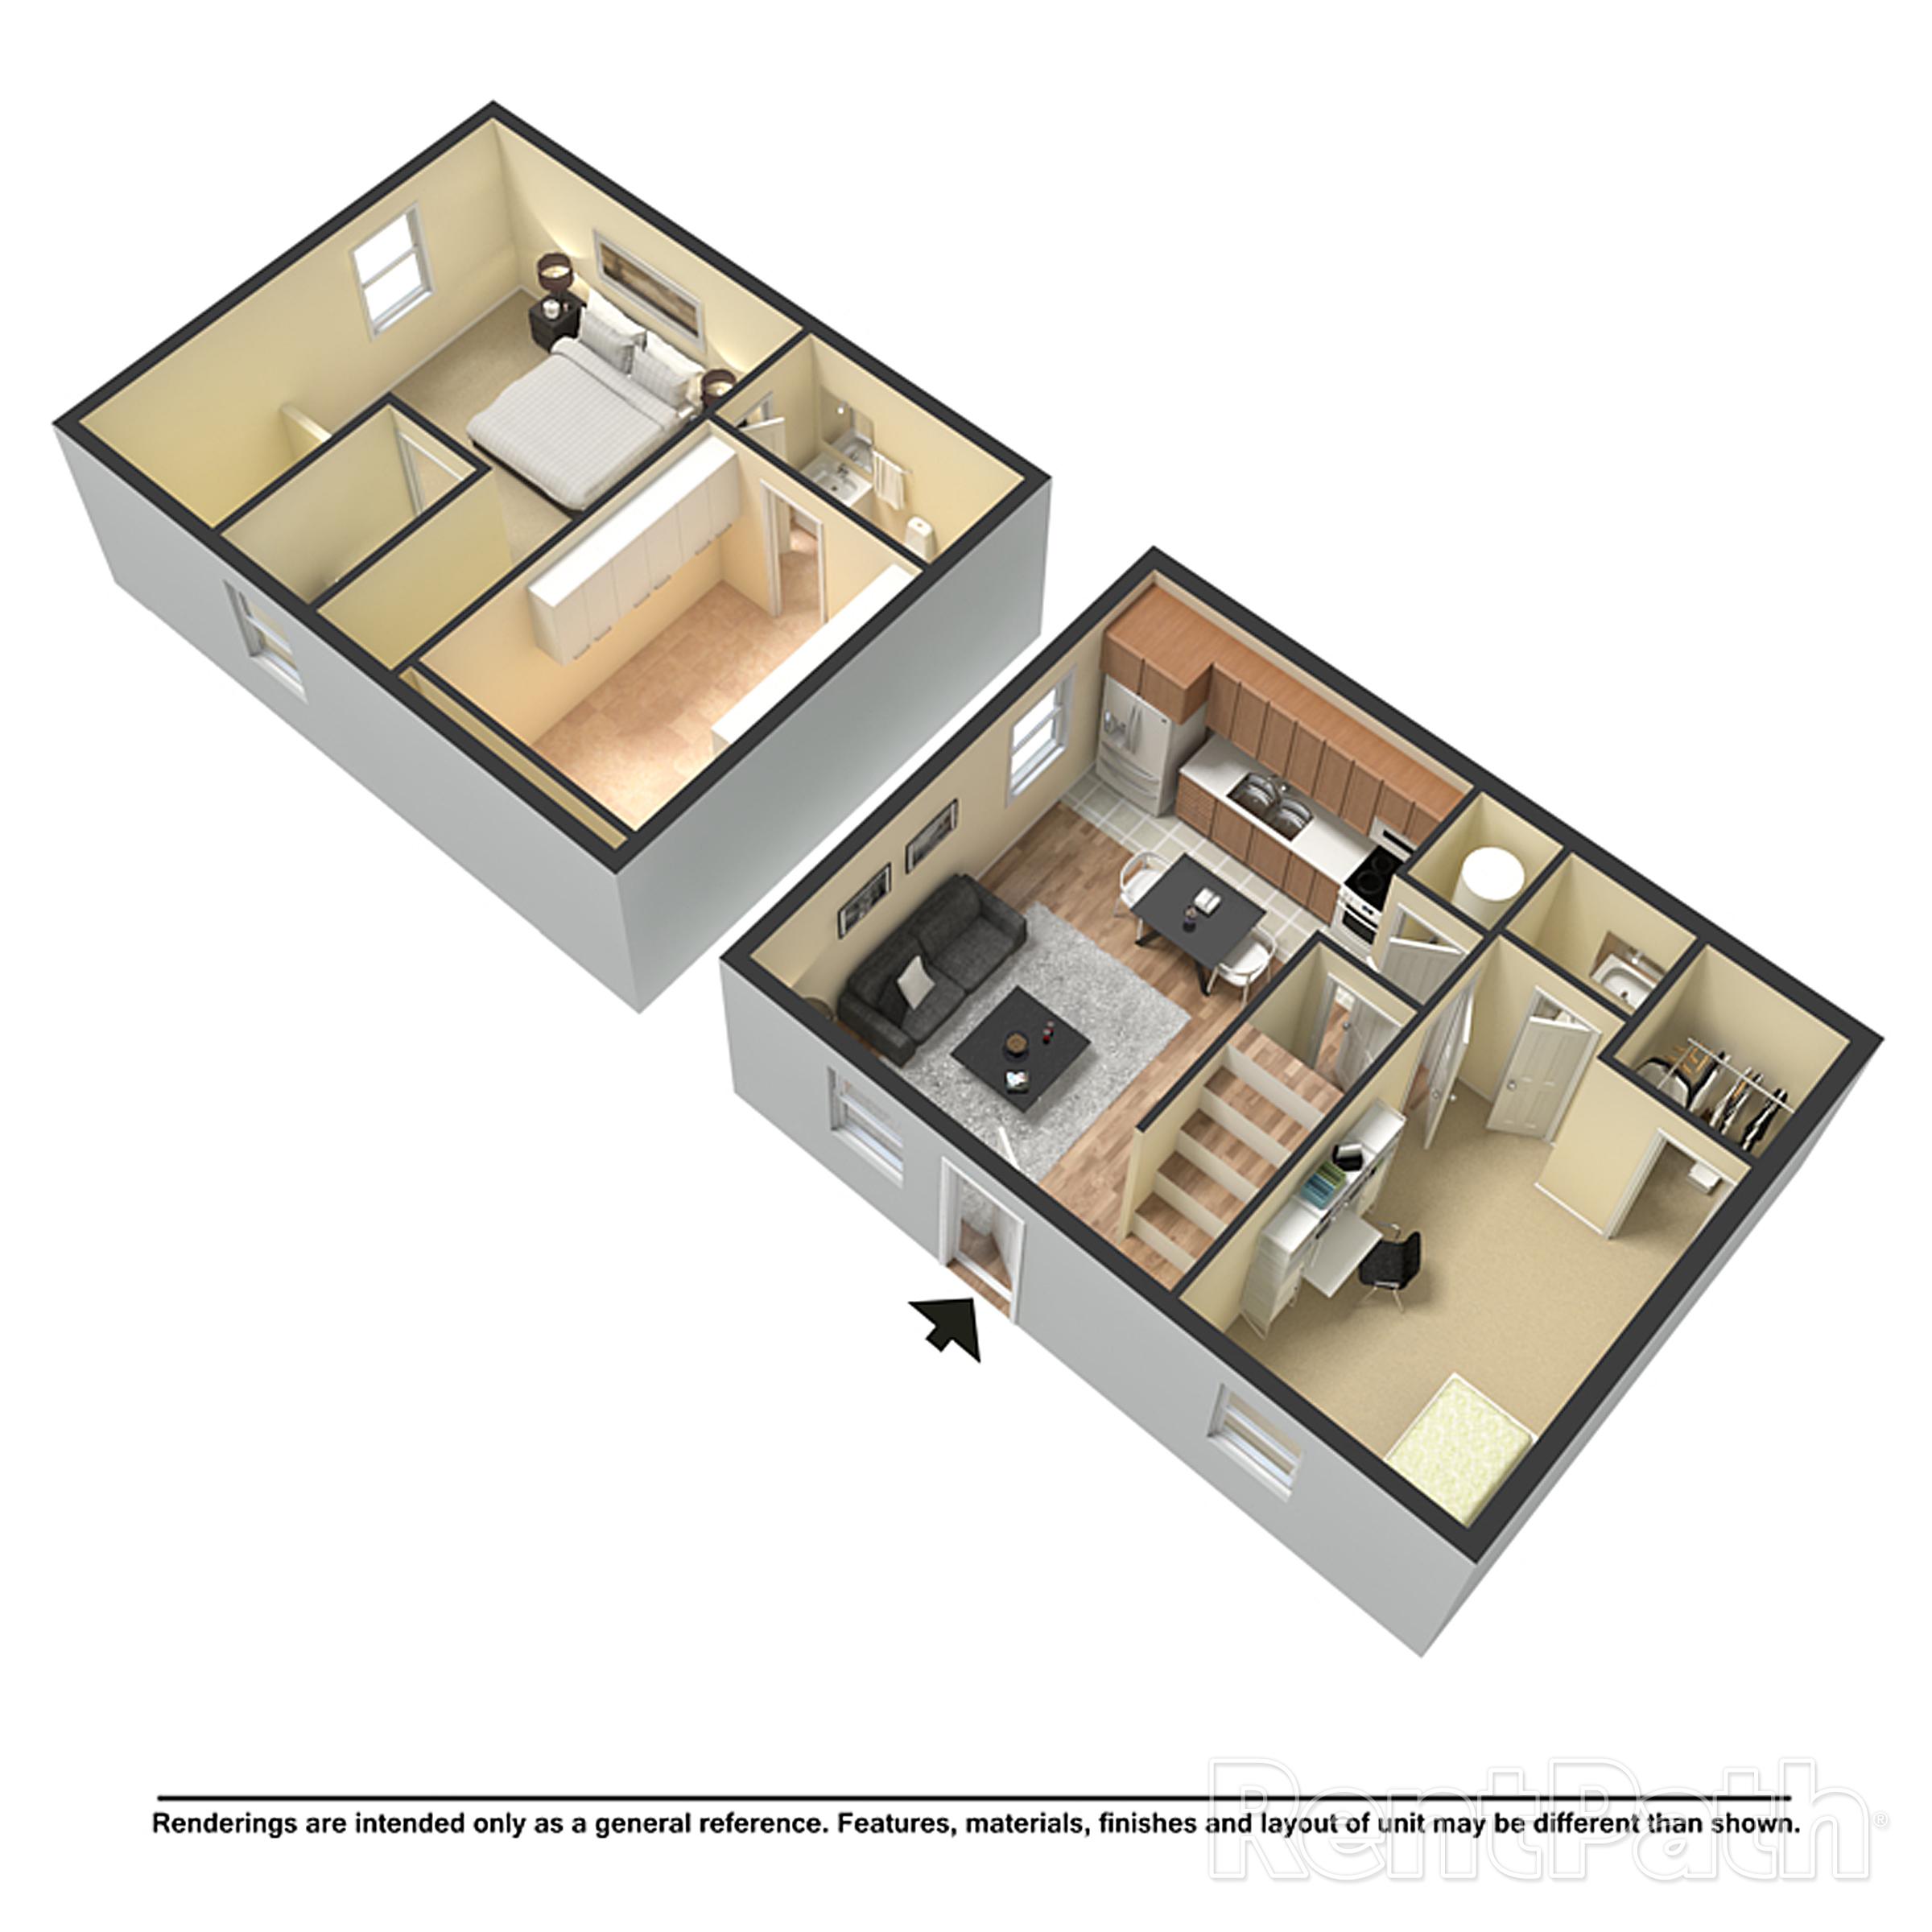 3d 2 bedroom townhouse furnished.jpg